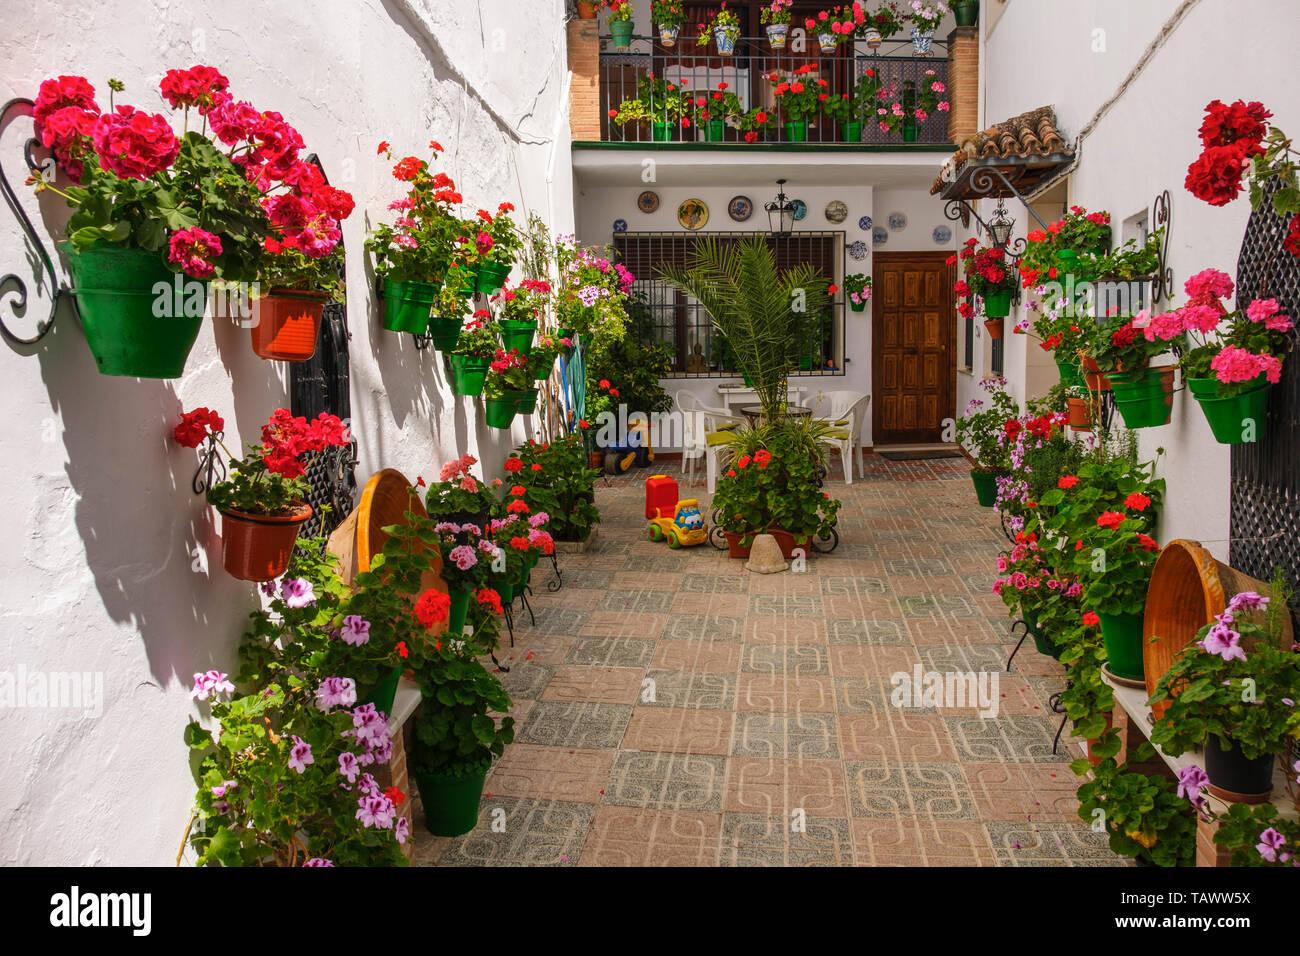 Typical street with flowers in Barrio de la Villa, Priego de Cordoba. Cordoba province, southern Andalusia. Spain Europe Stock Photo